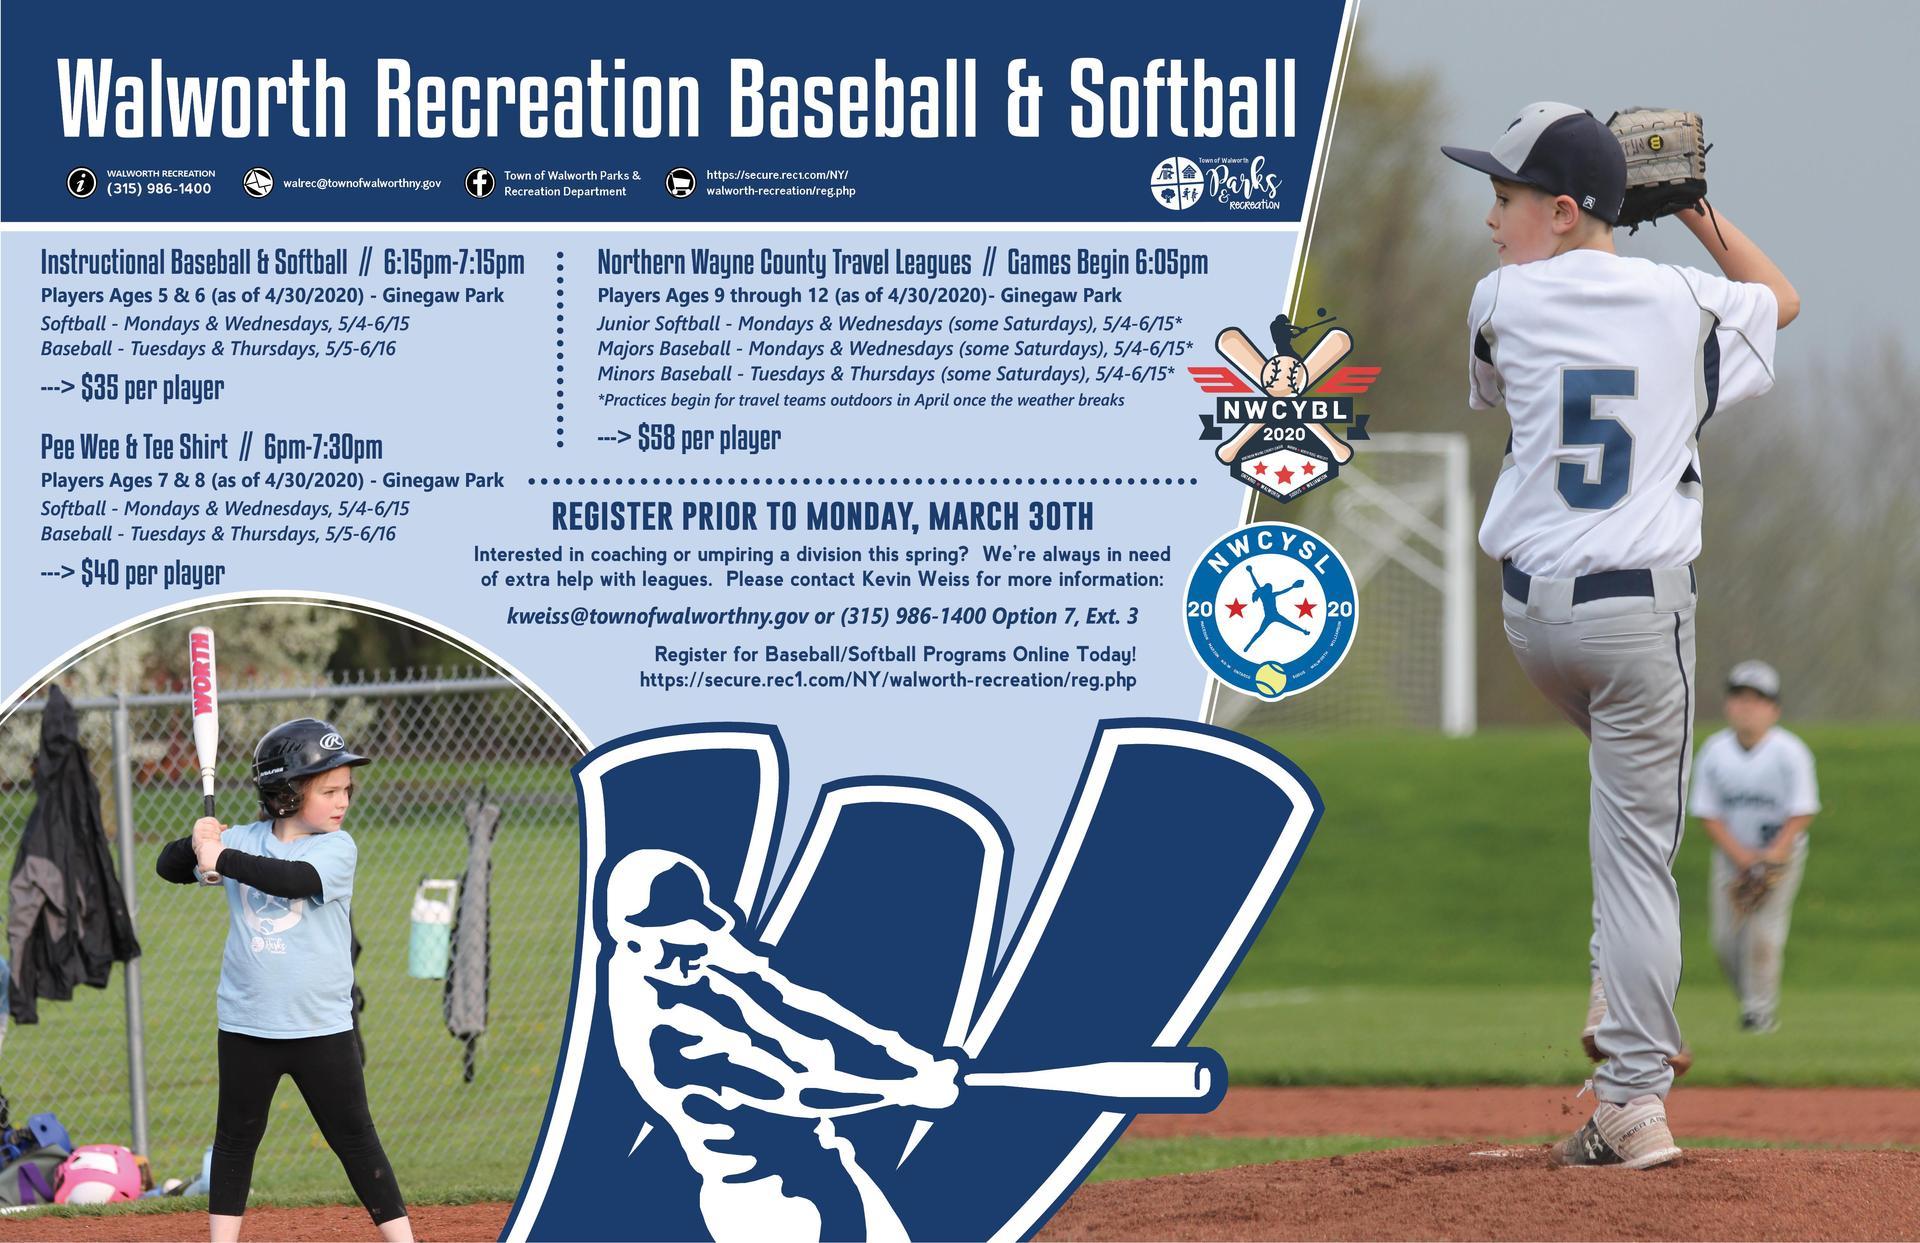 Walworth Rec Baseball